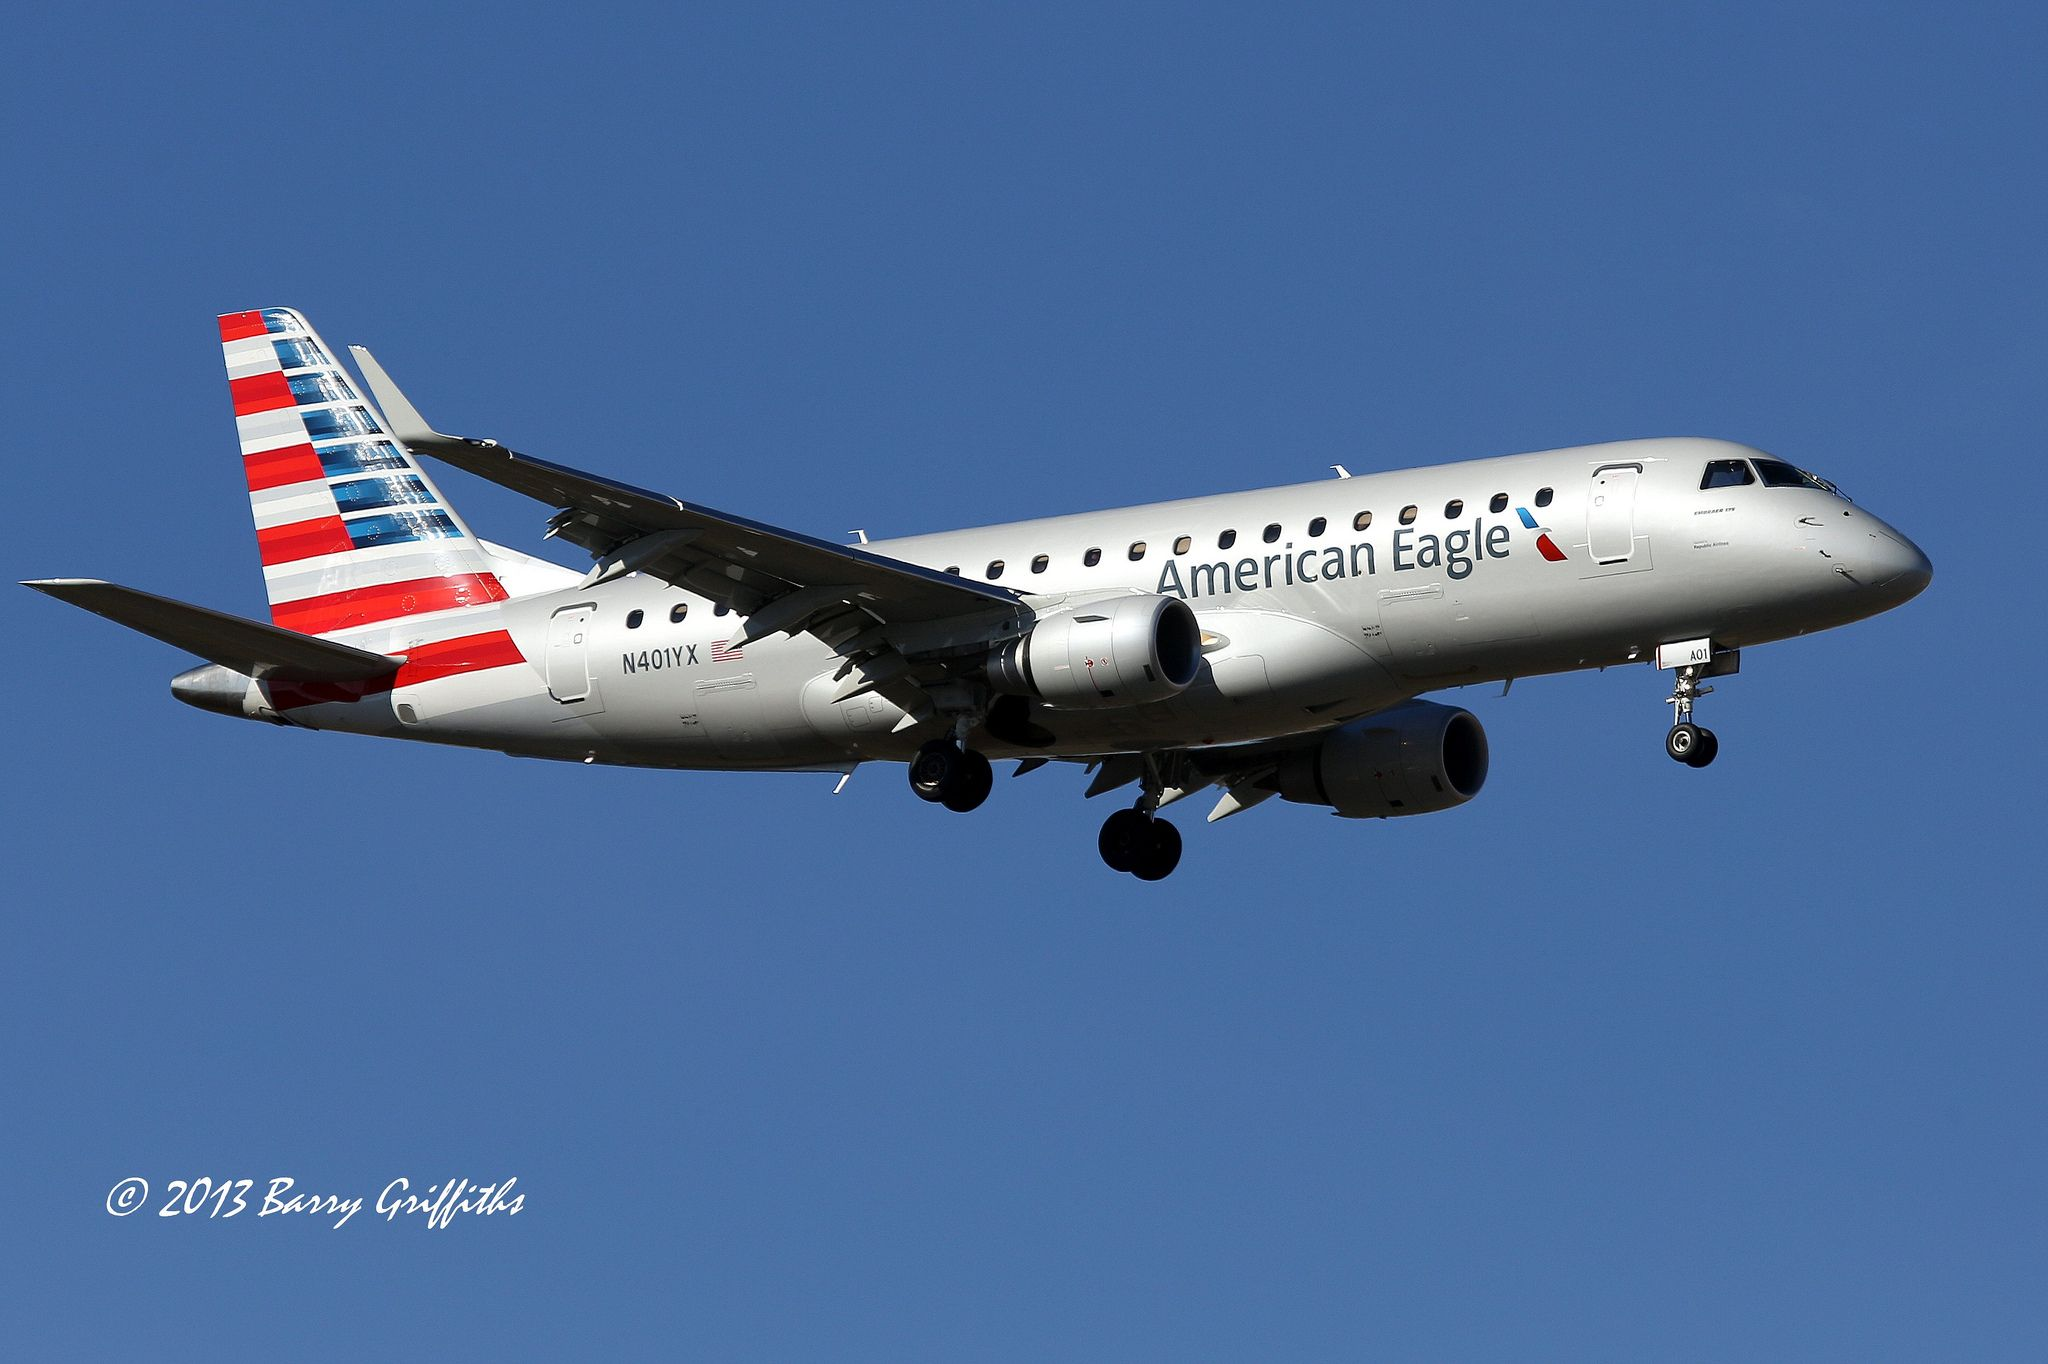 Embraer ERJ 170200LR s/n 17000363 (2013) American Eagle